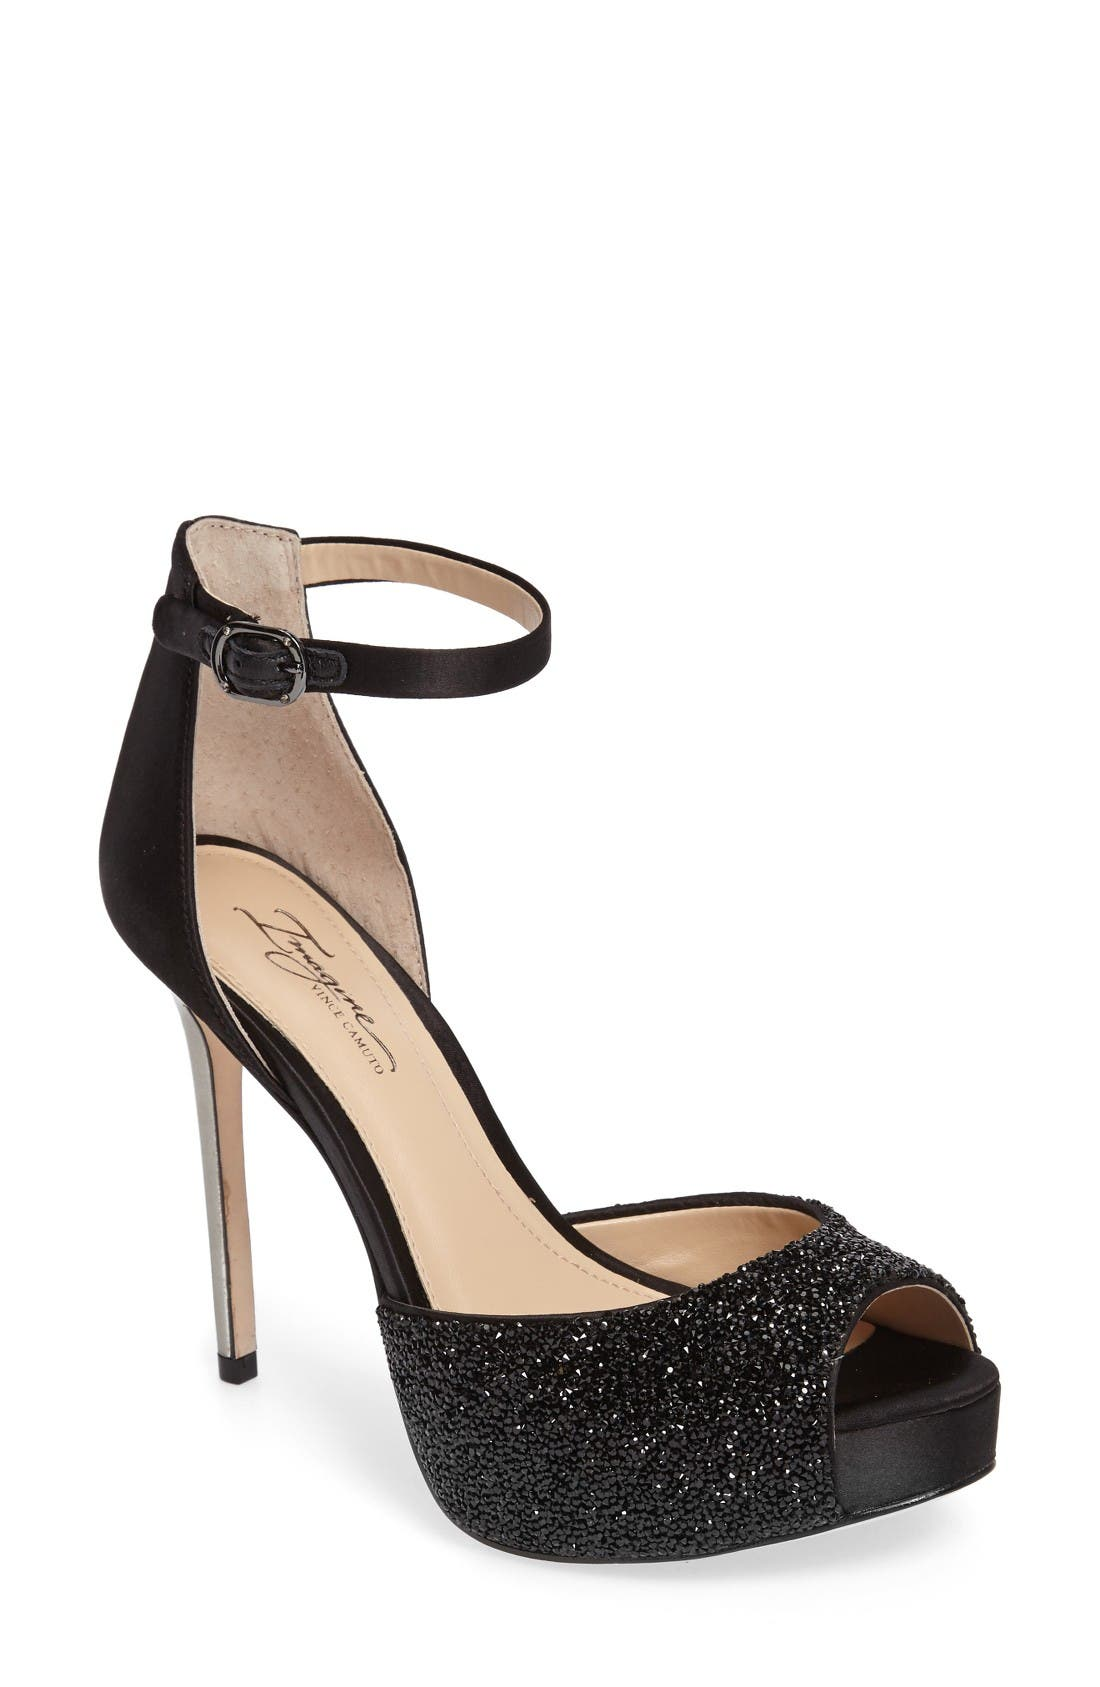 IMAGINE BY VINCE CAMUTO Karleigh Platform Sandal